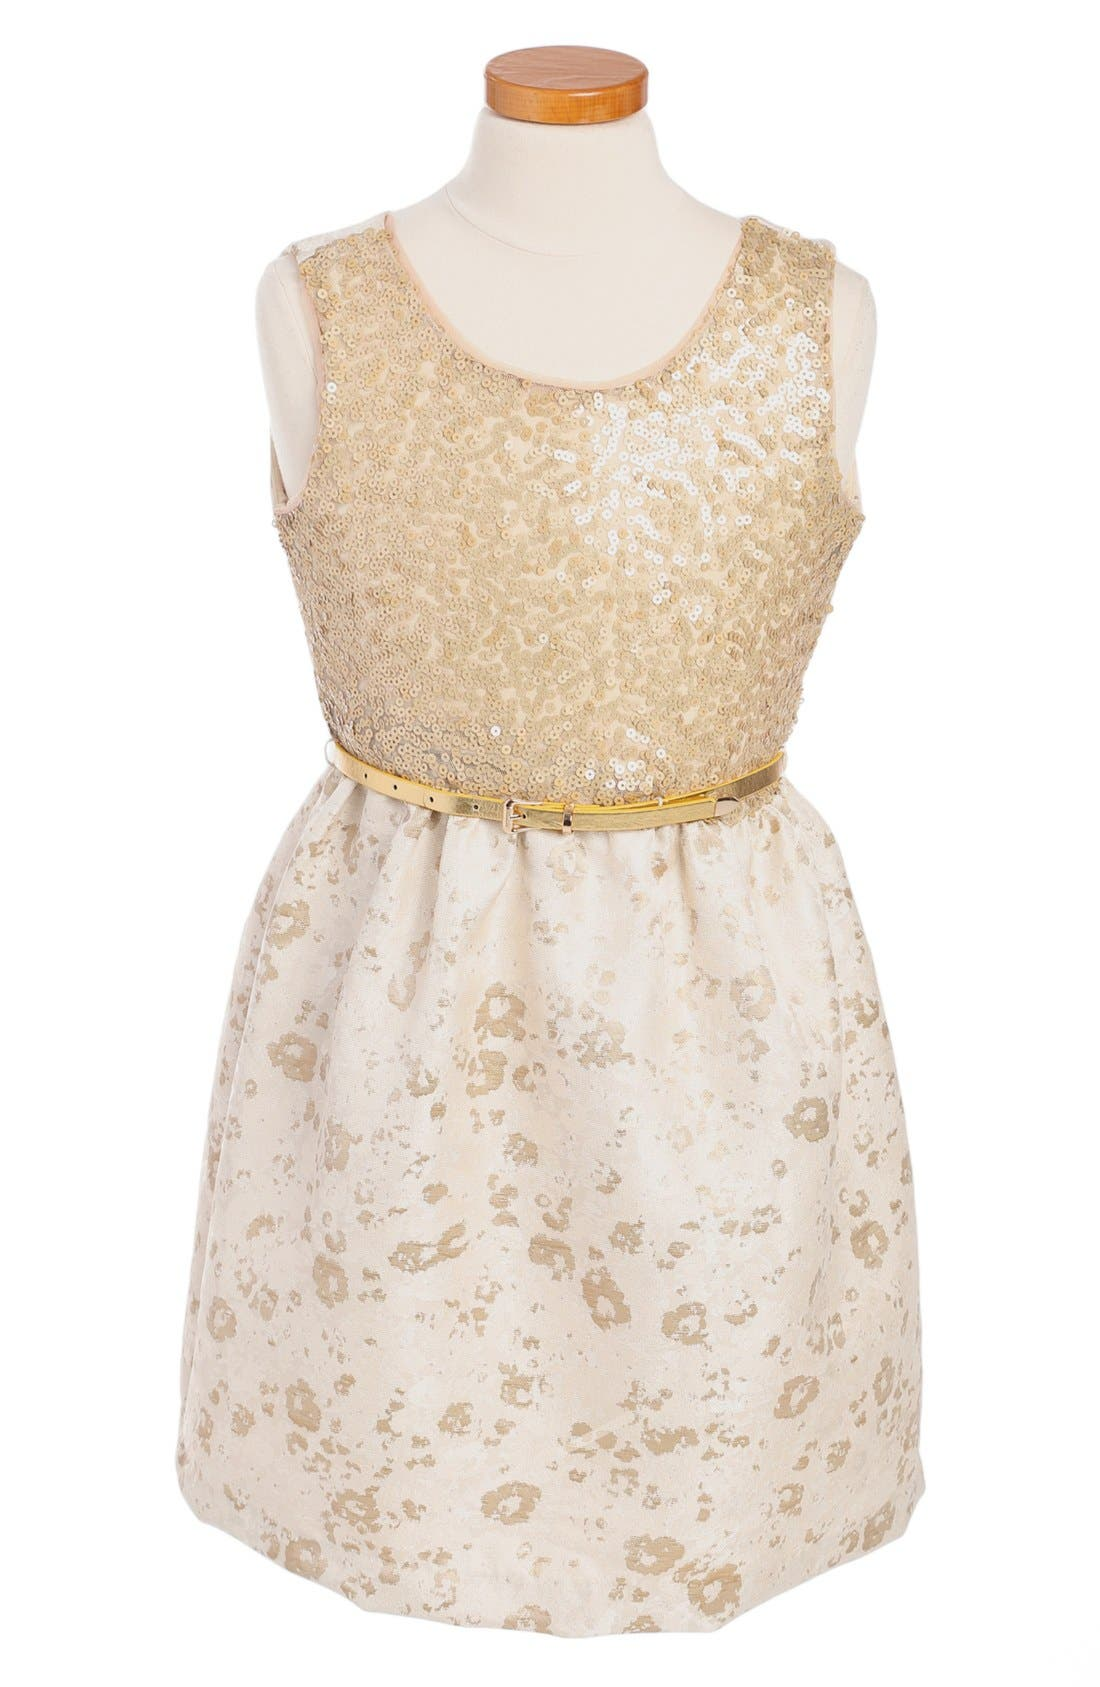 Main Image - BLUSH by Us Angels Sleeveless Dress (Big Girls)